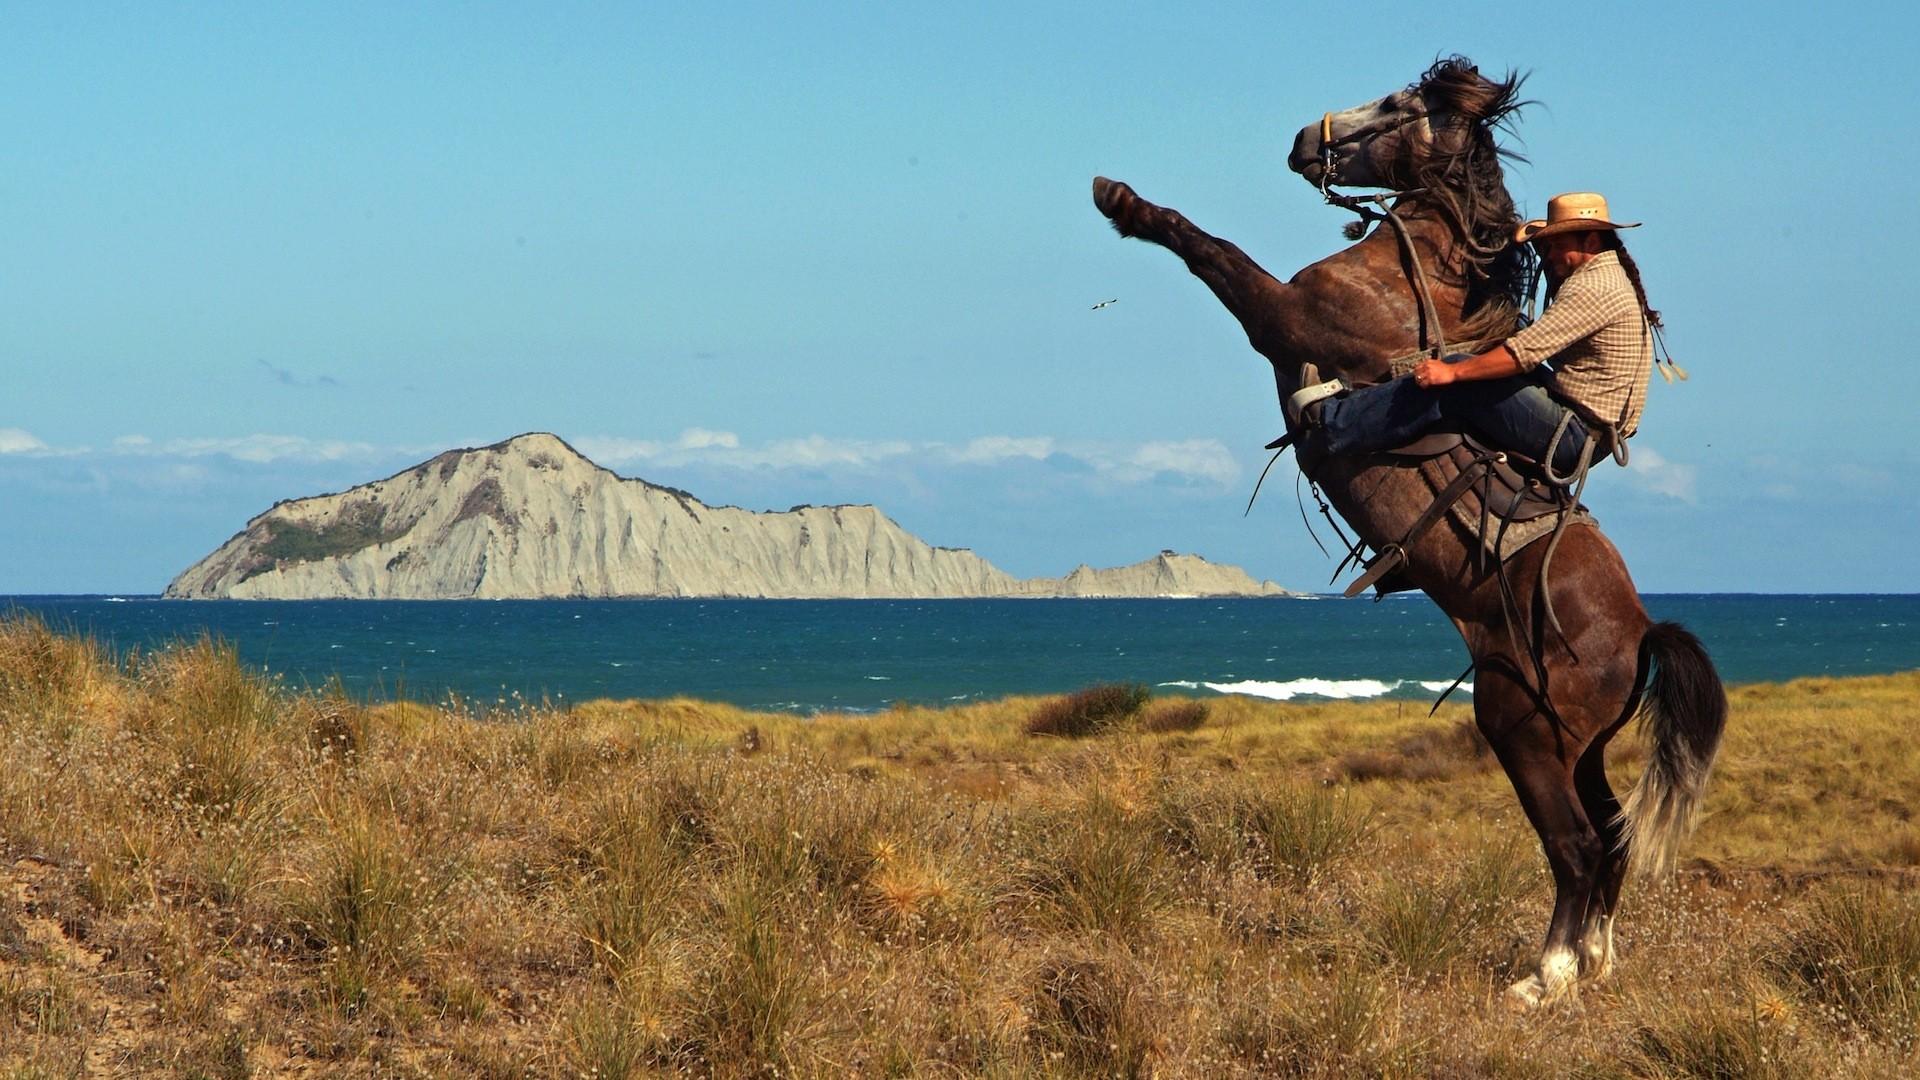 Incredible Ghost Rider Horse Wallpaper Te Maleficent Cowboy Hd 1920x1080 Wallpaper Teahub Io